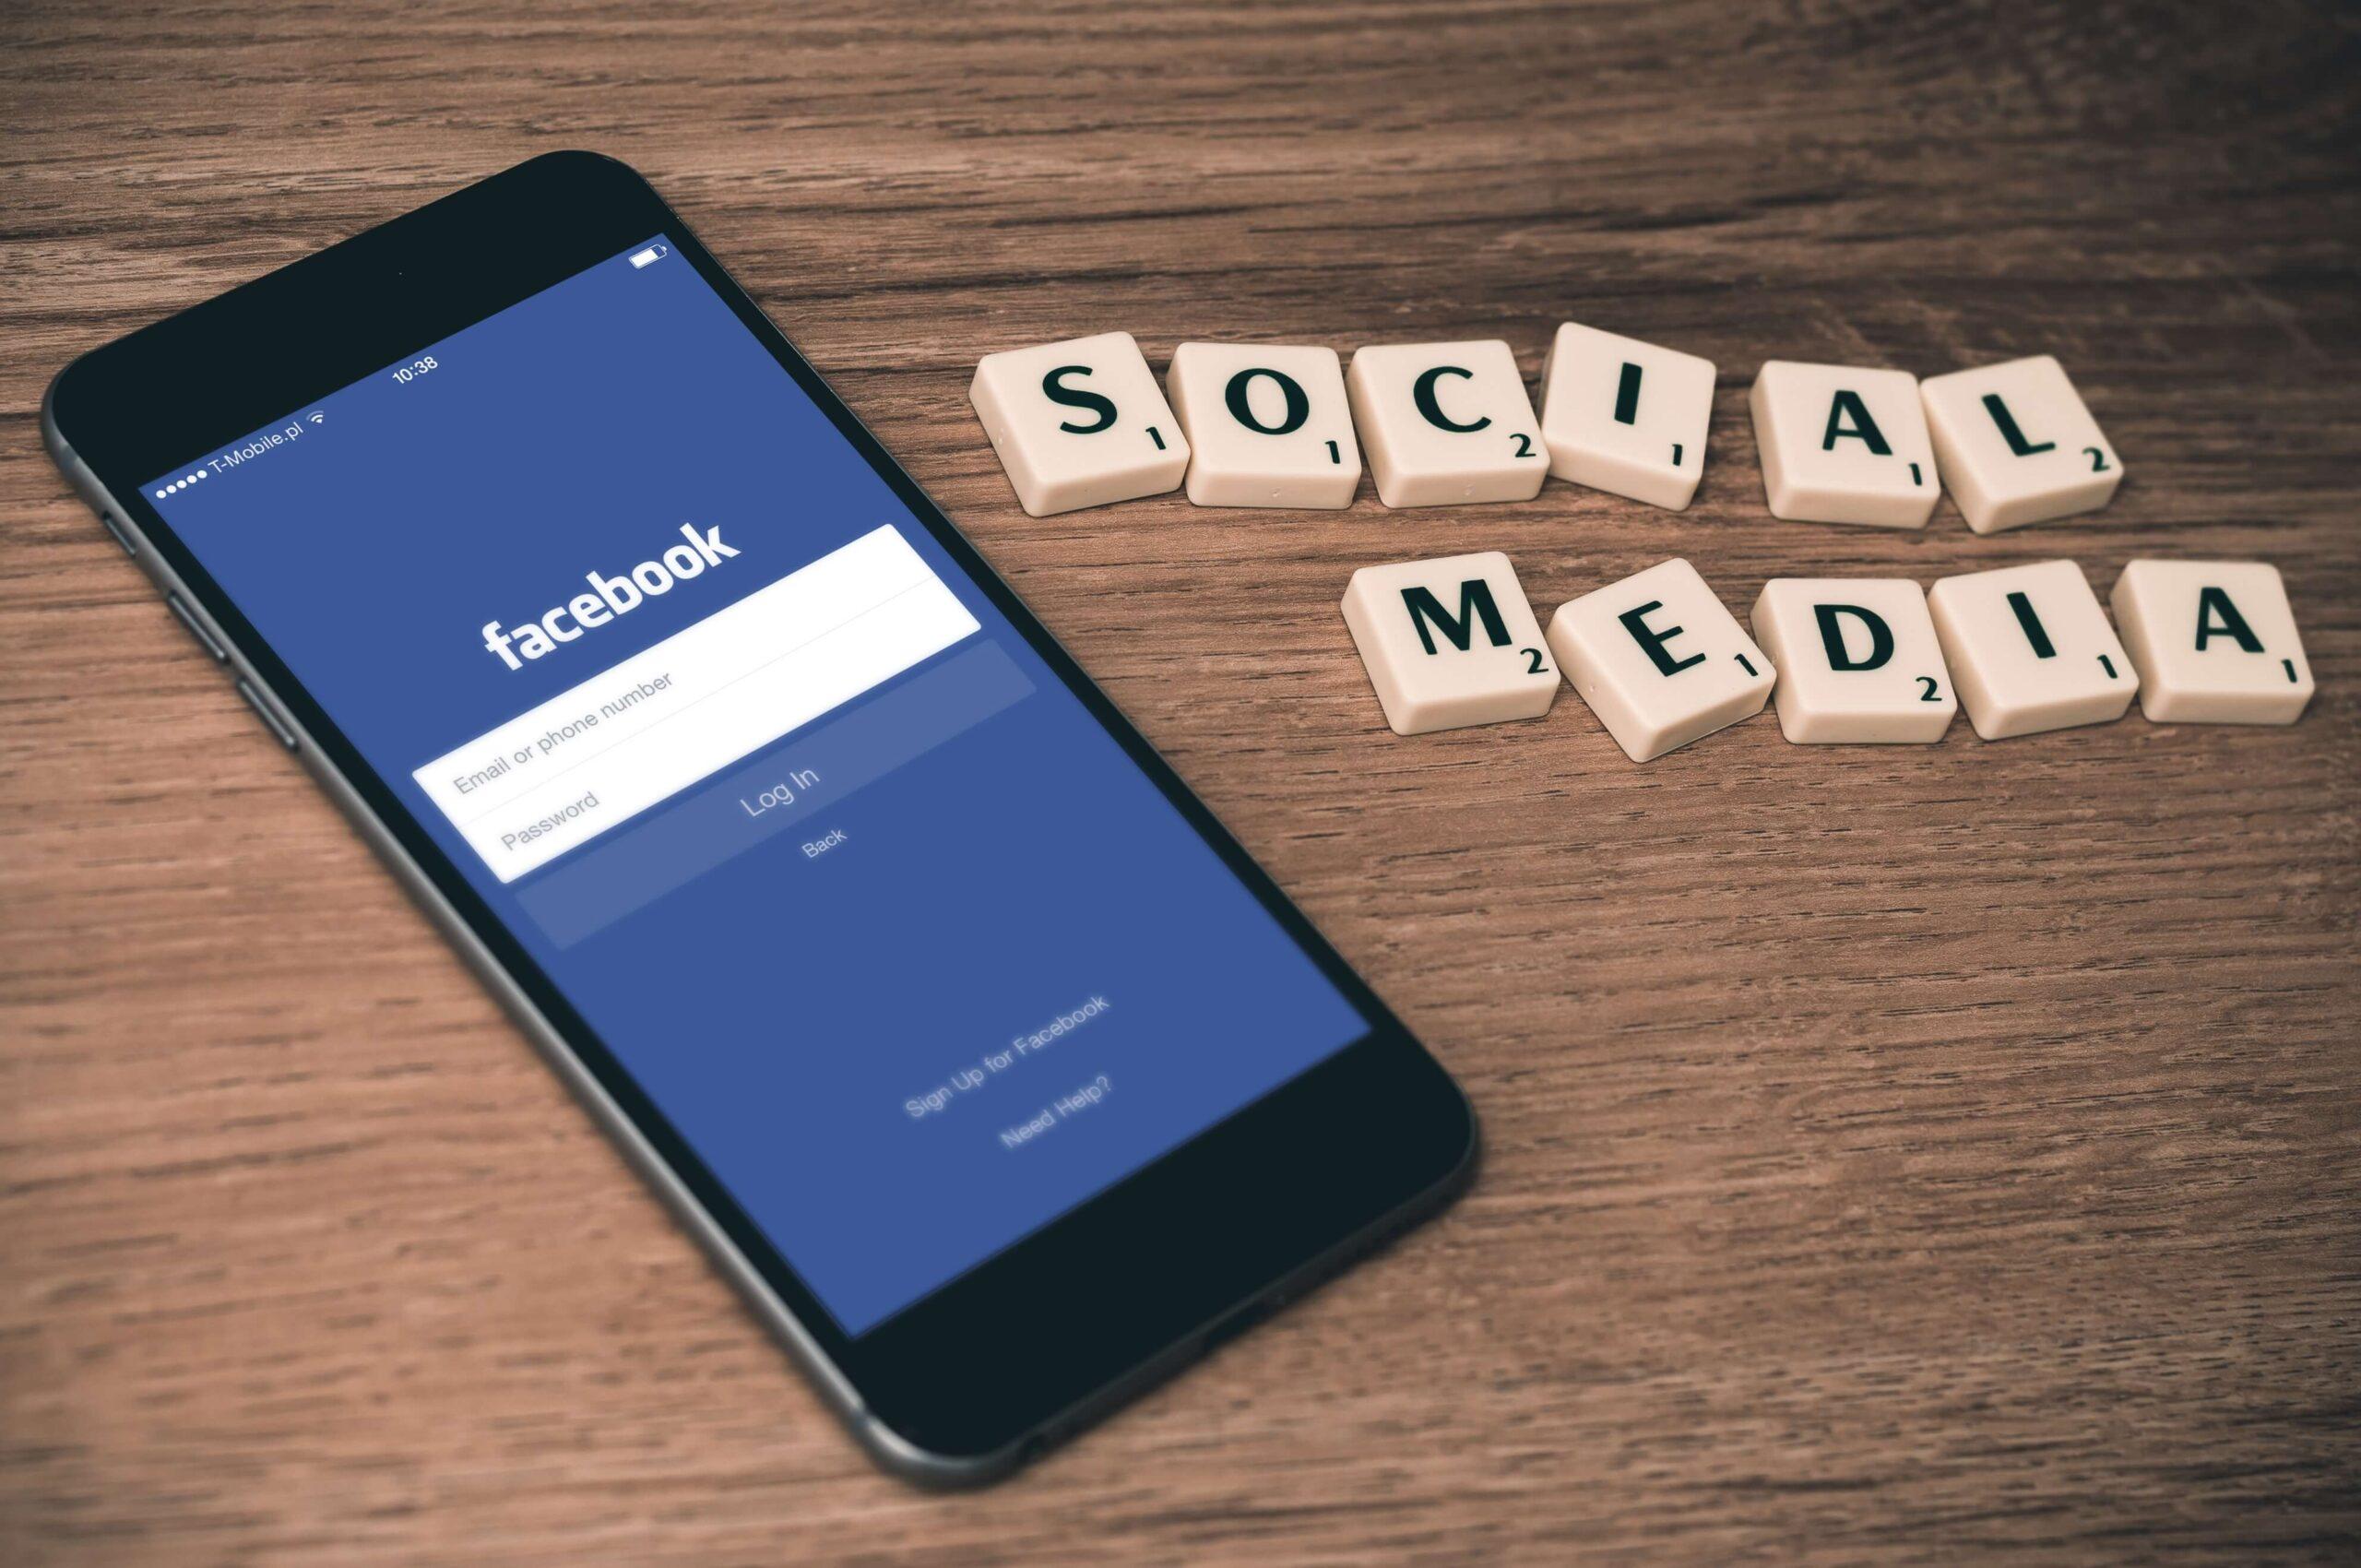 dimensioni immagini facebook 2018